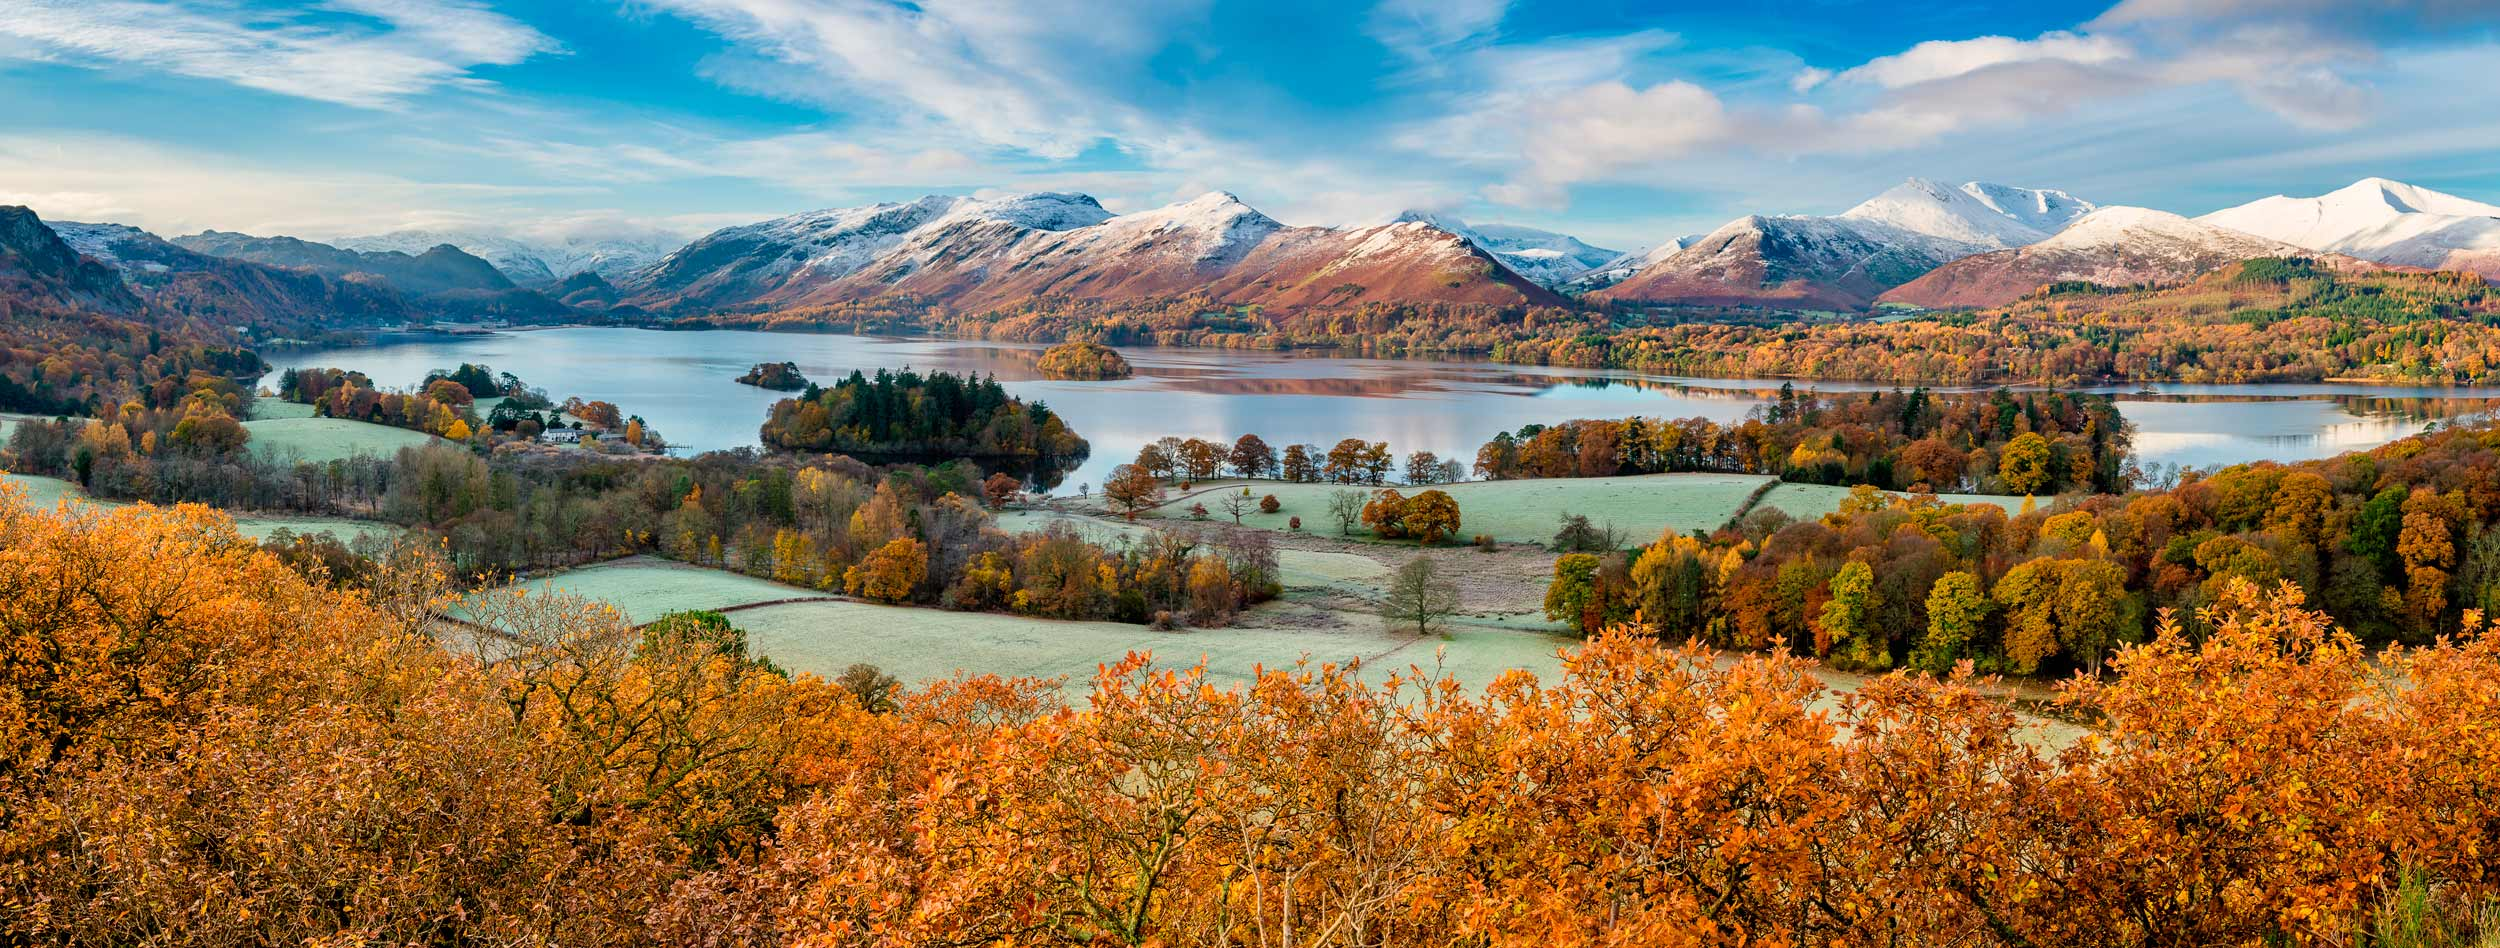 Brrrr.... Derwentwater, in the Lake District, England  (Daniel_Kay/Shutterstock)